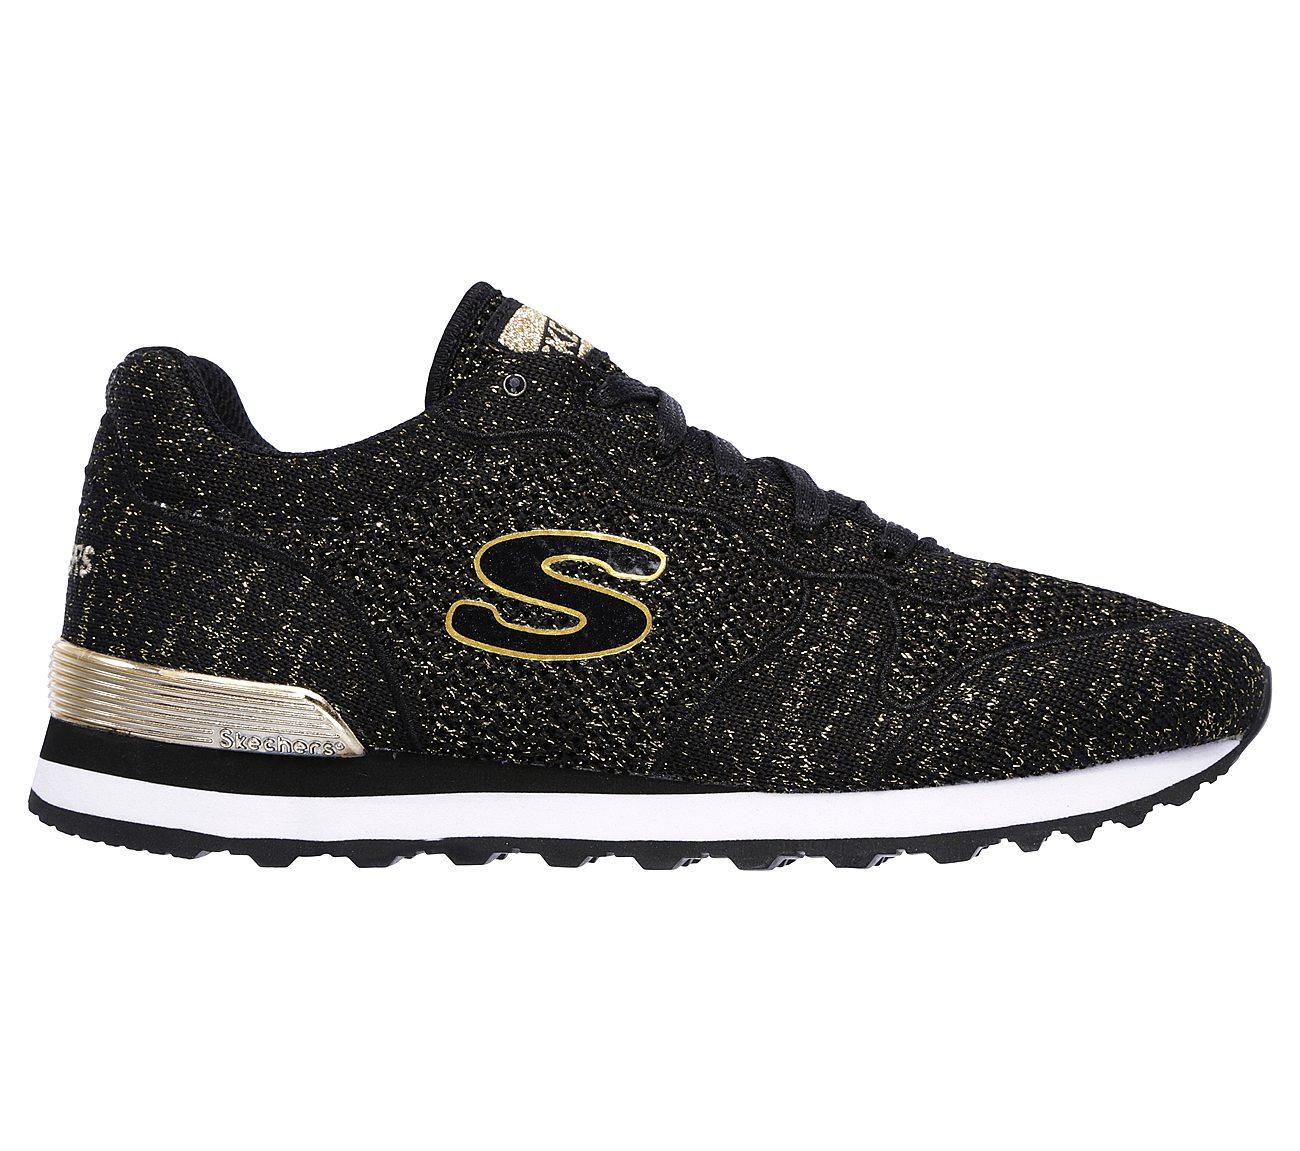 7776b7034300 Buy SKECHERS OG 85 - Low Flyers SKECHER Street Shoes only £64.00